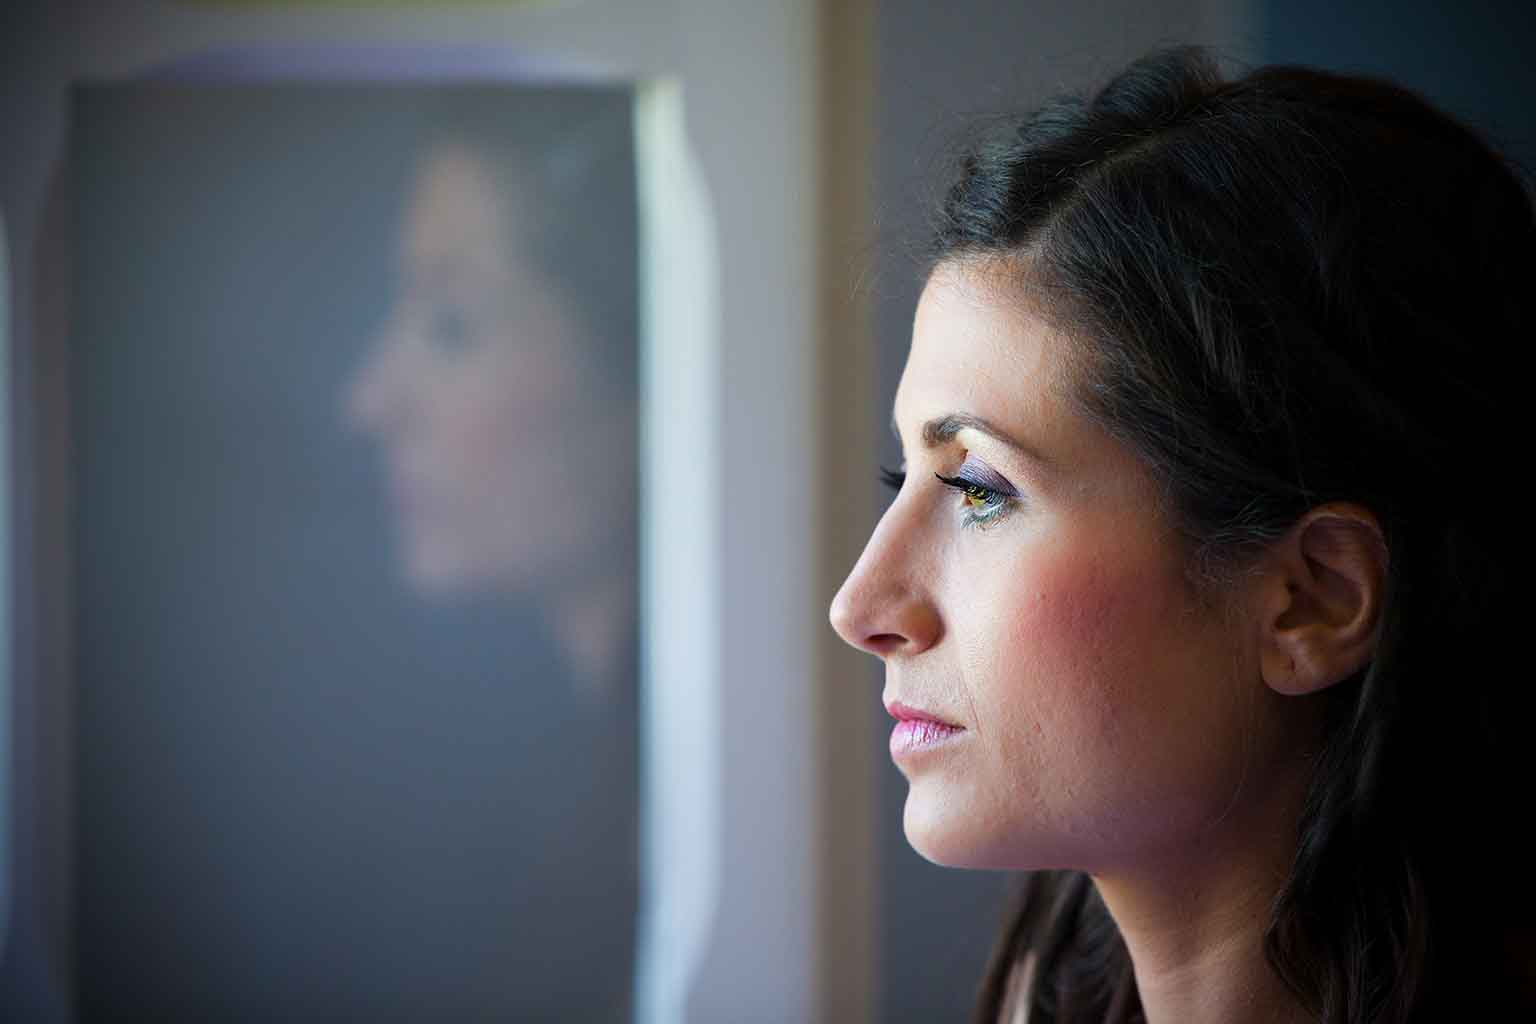 Chica mirando por una ventana